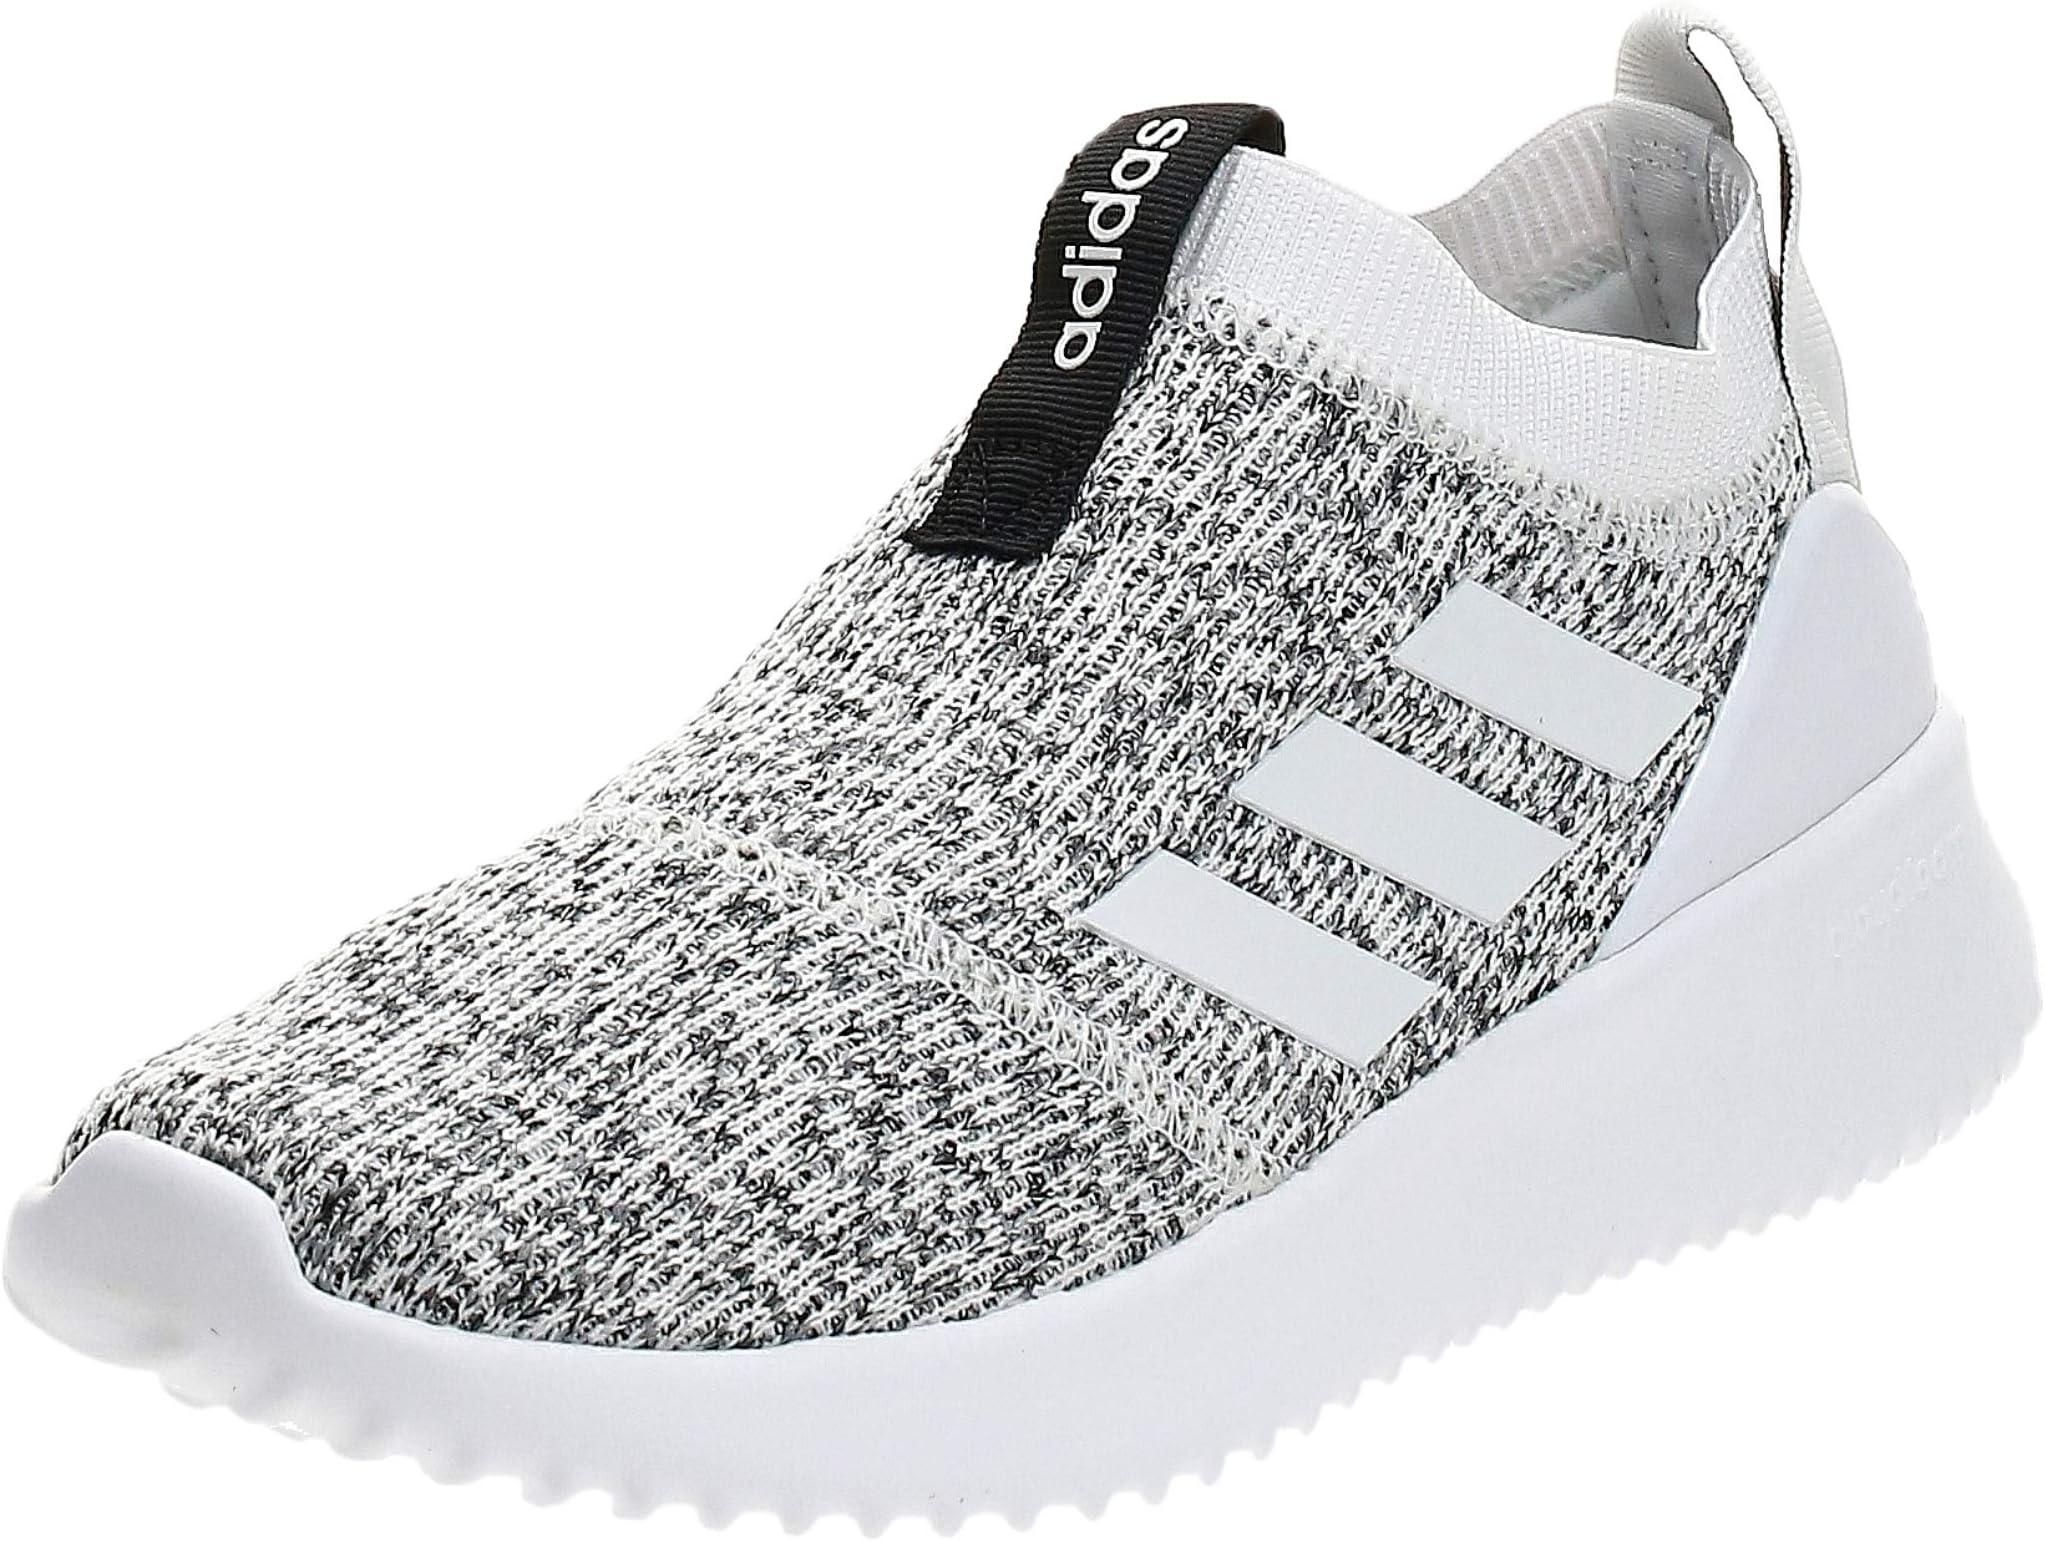 adidas ultimafusion running shoe